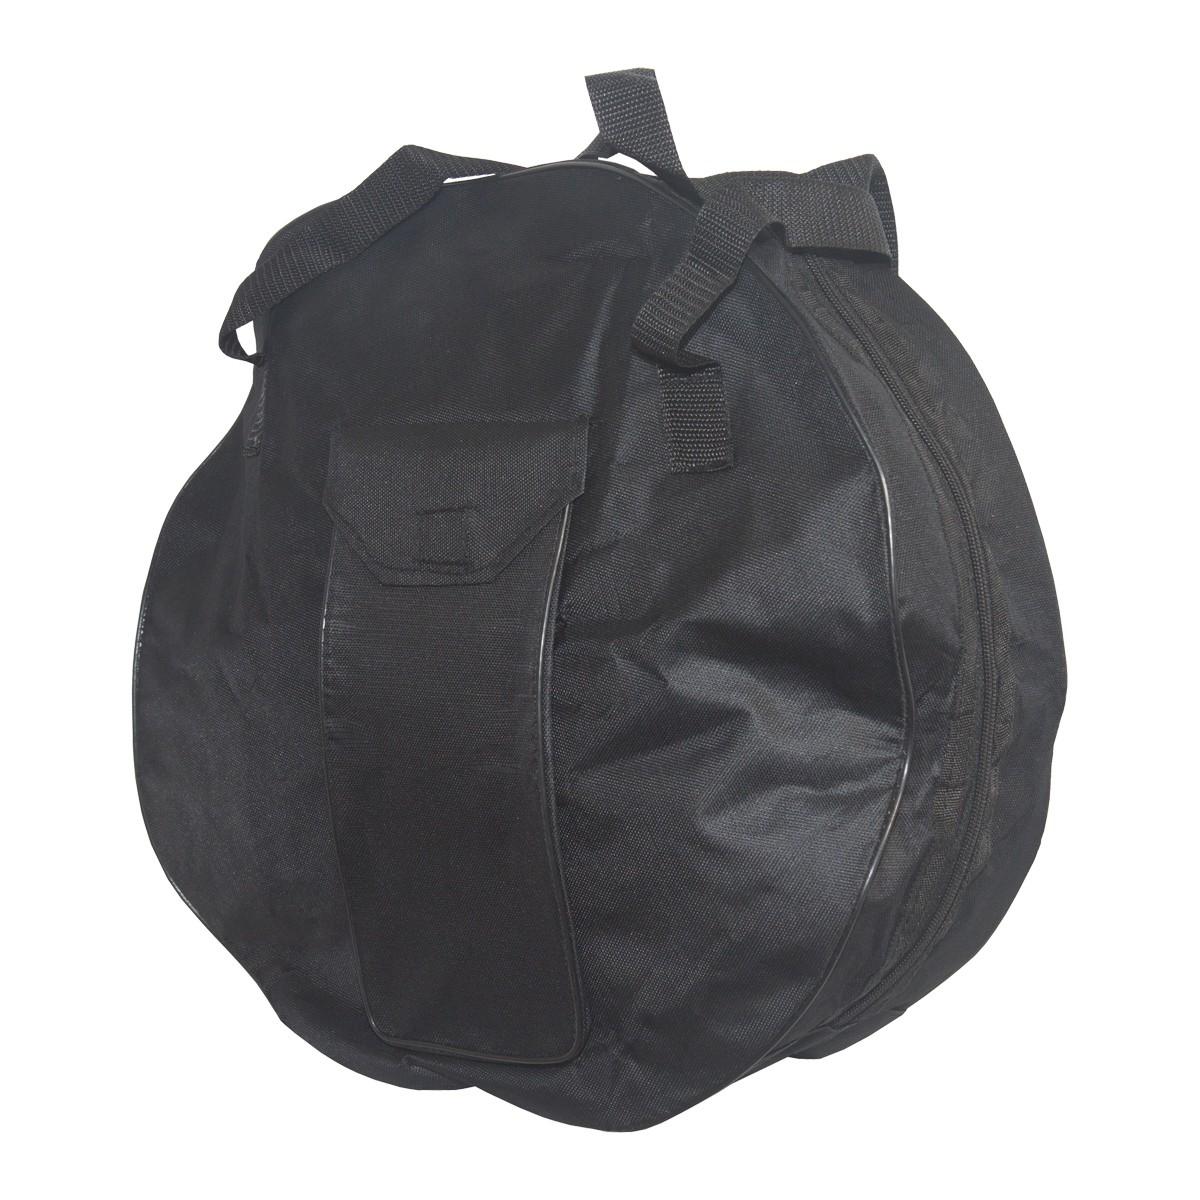 Roosebeck Economy Gig Bag for Bodhran 16'x 4.5'